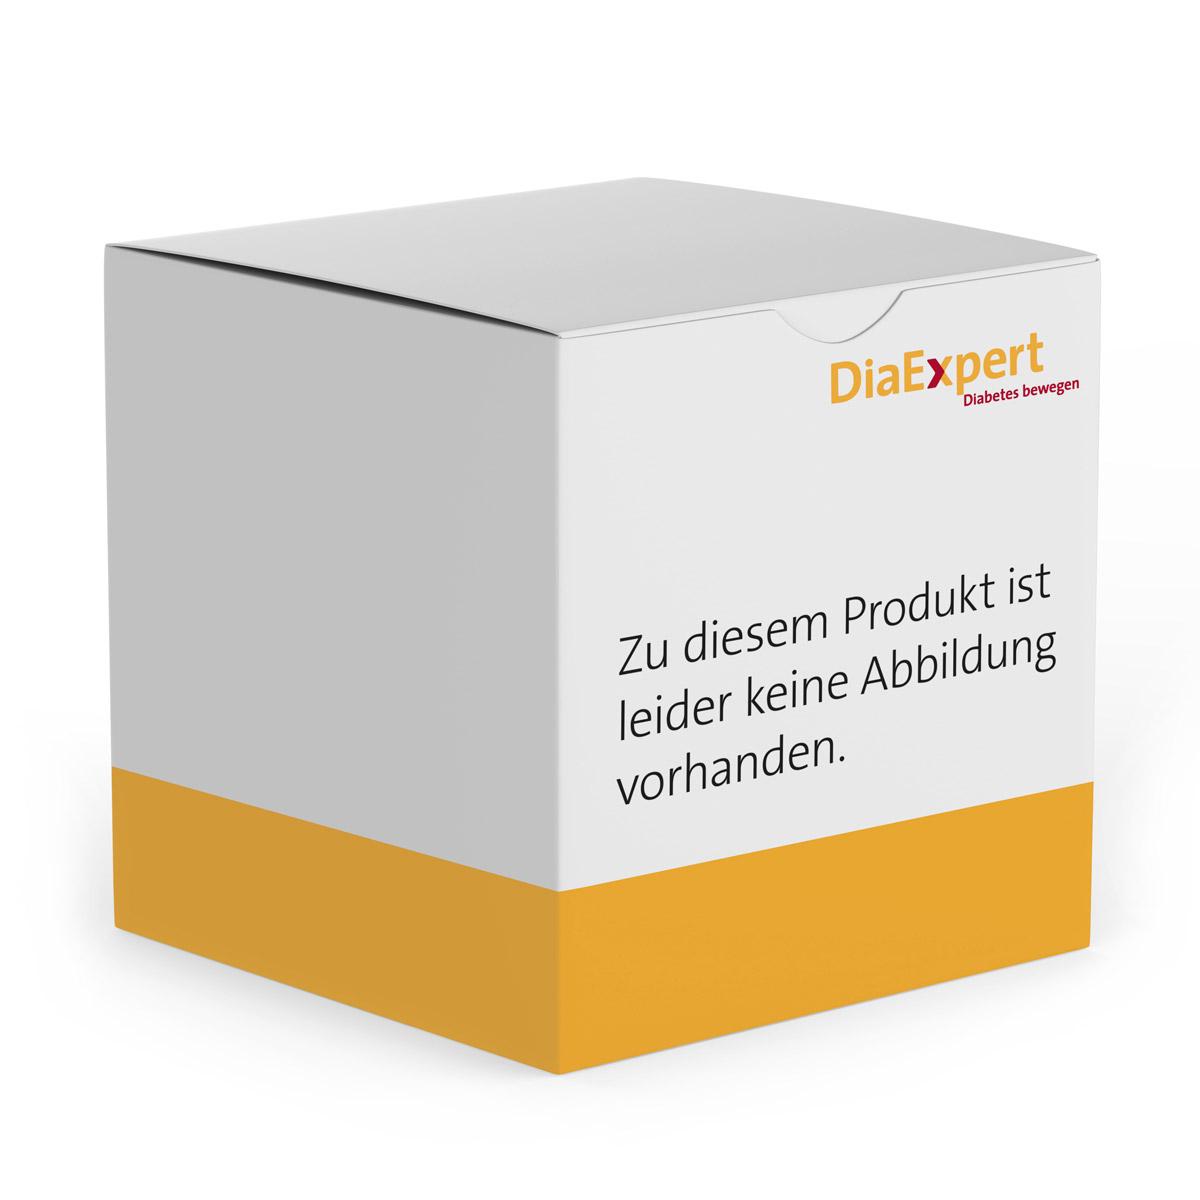 diaexpert neopren tasche mit rei verschlu schwarz minimed 5 er serie insulinpumpen zubeh r. Black Bedroom Furniture Sets. Home Design Ideas